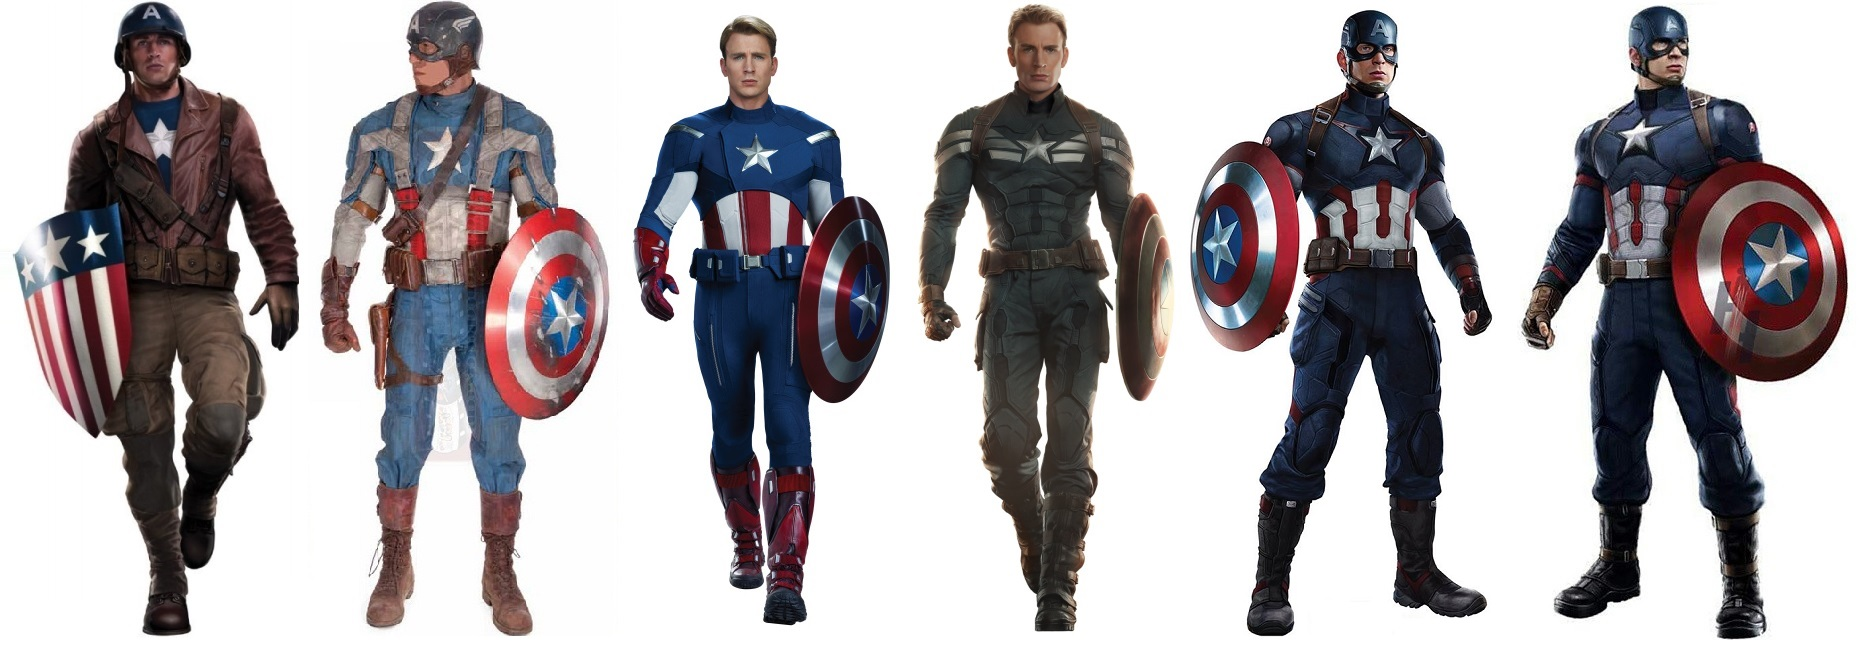 Captain America : Civil War [Marvel - 2016] - Page 4 Captain-america-costume-uniform-evolution-movie-avengers-civil-war